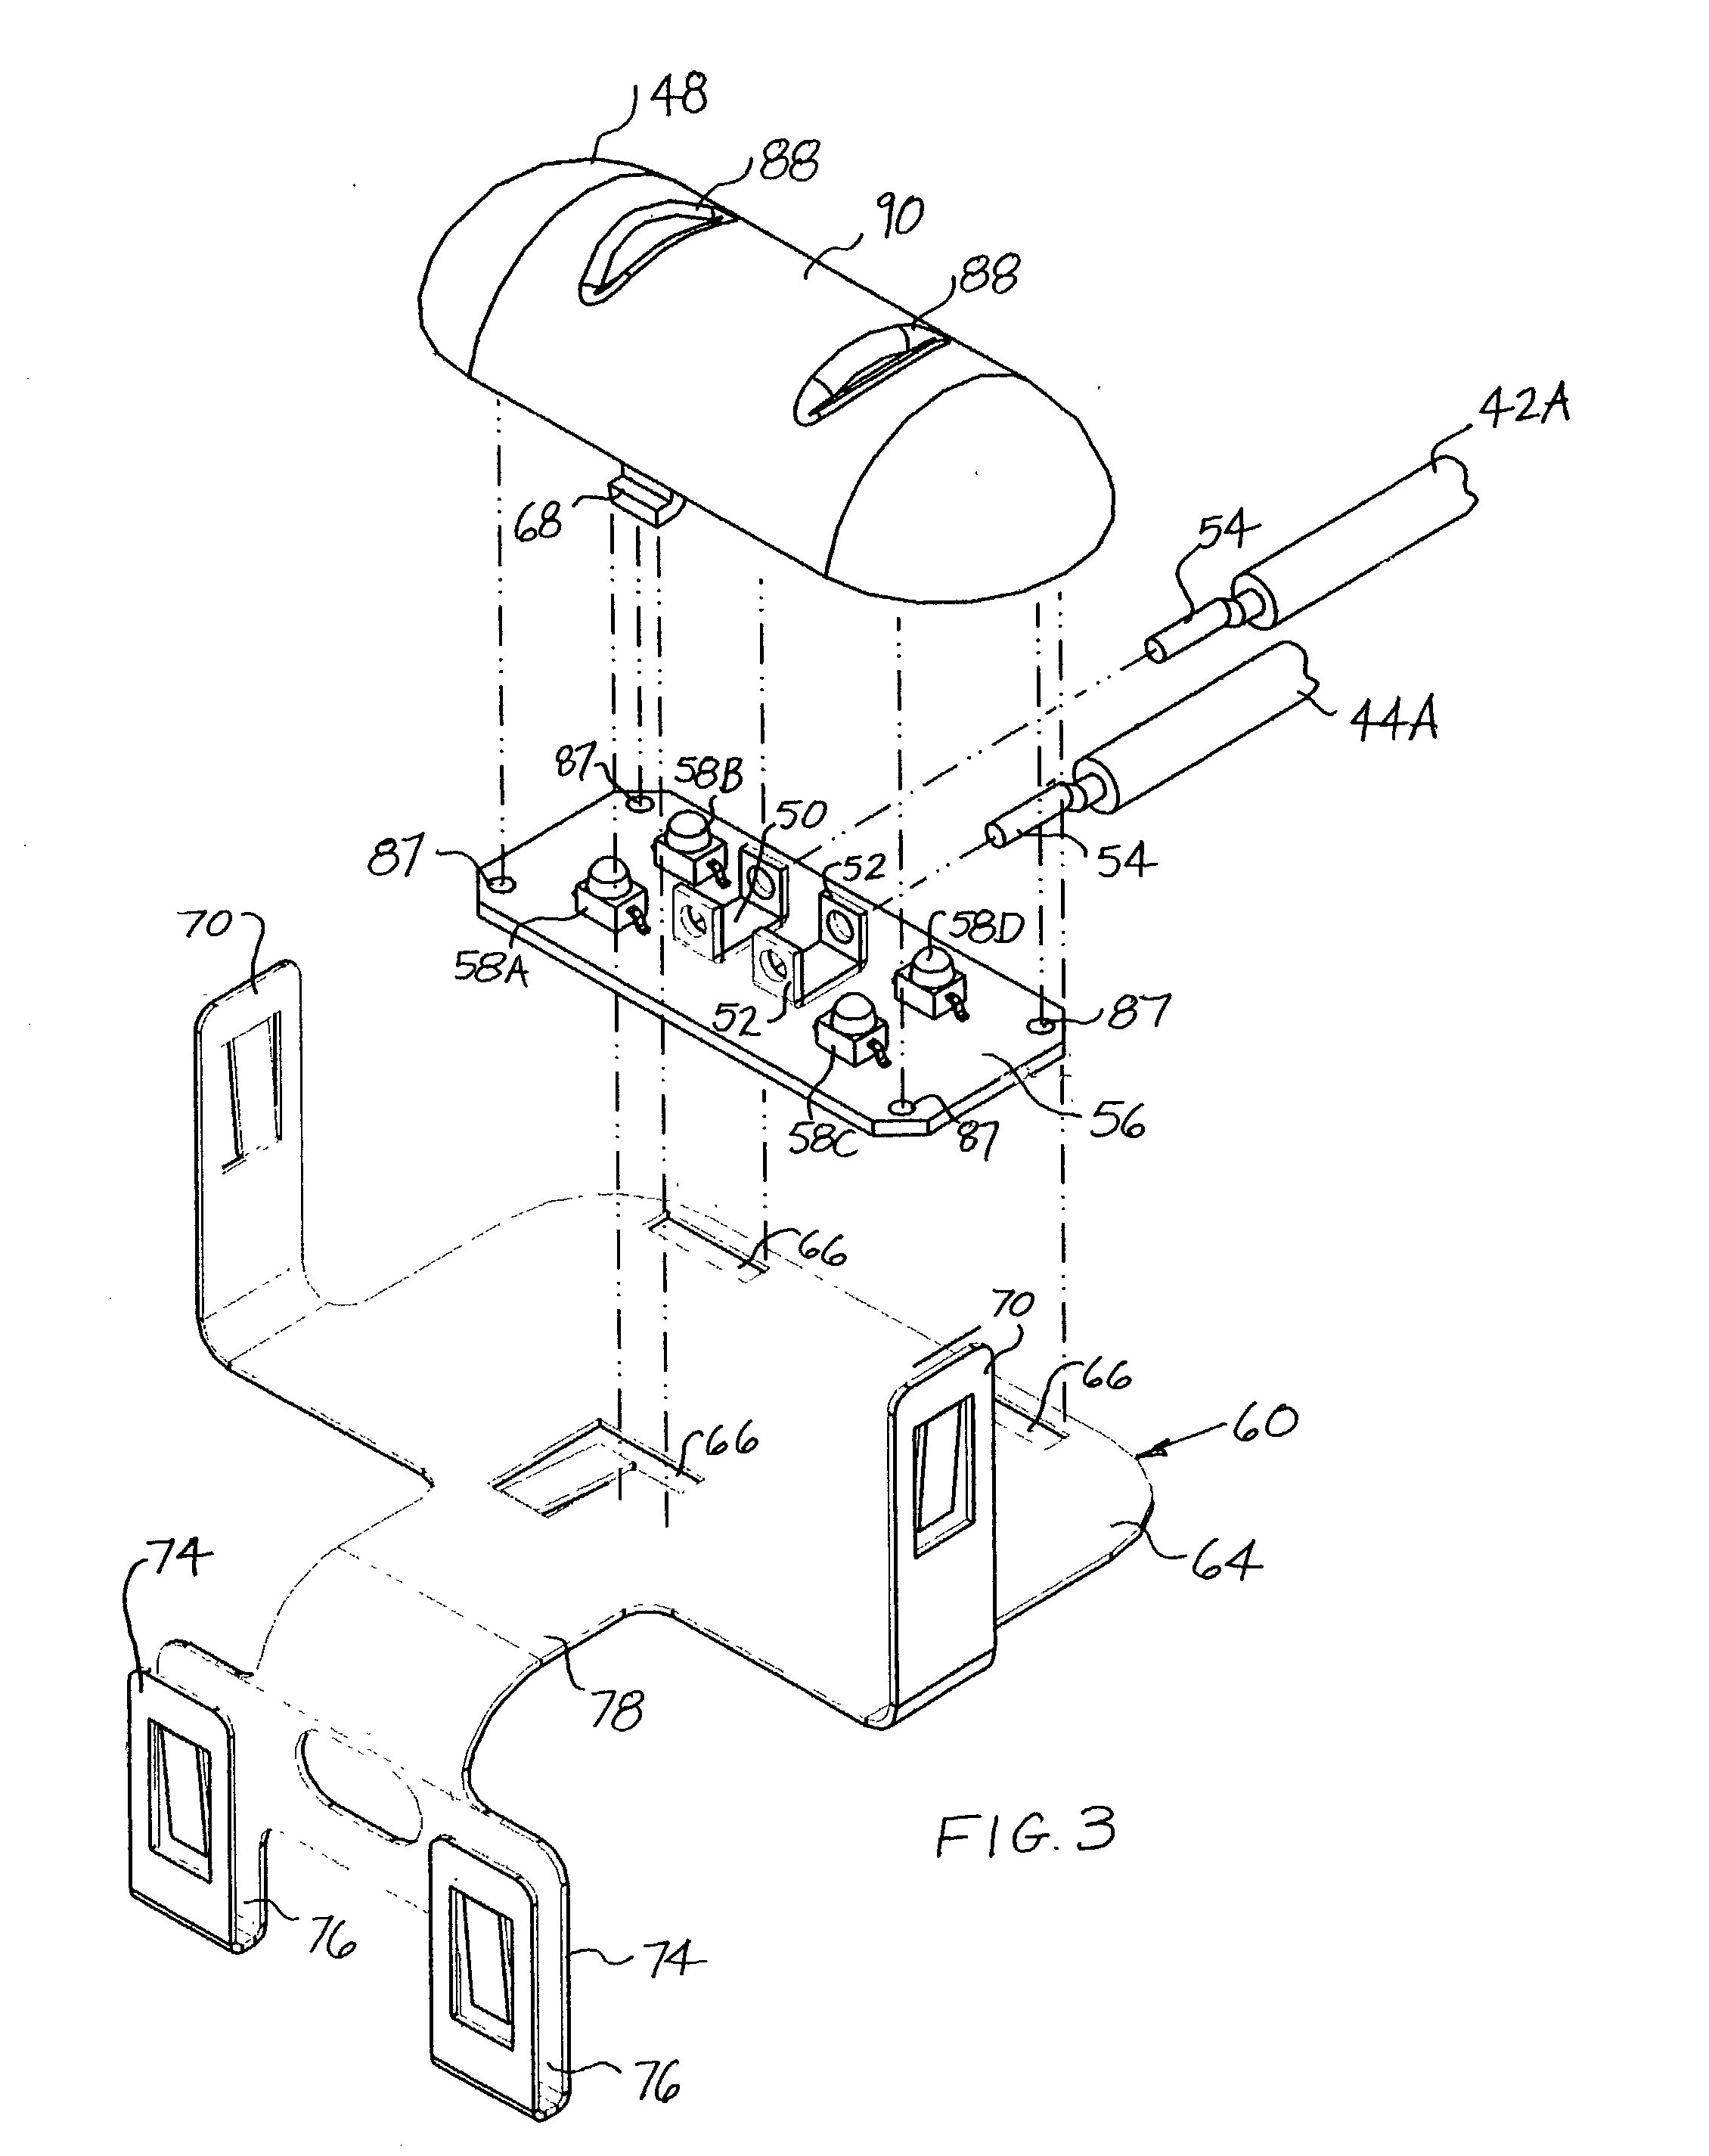 Niles Volume Control Wiring Diagram Modern Design Of Potentiometer Stereo Controls Speakercraft Ir Receiver 39 Switch To Marine